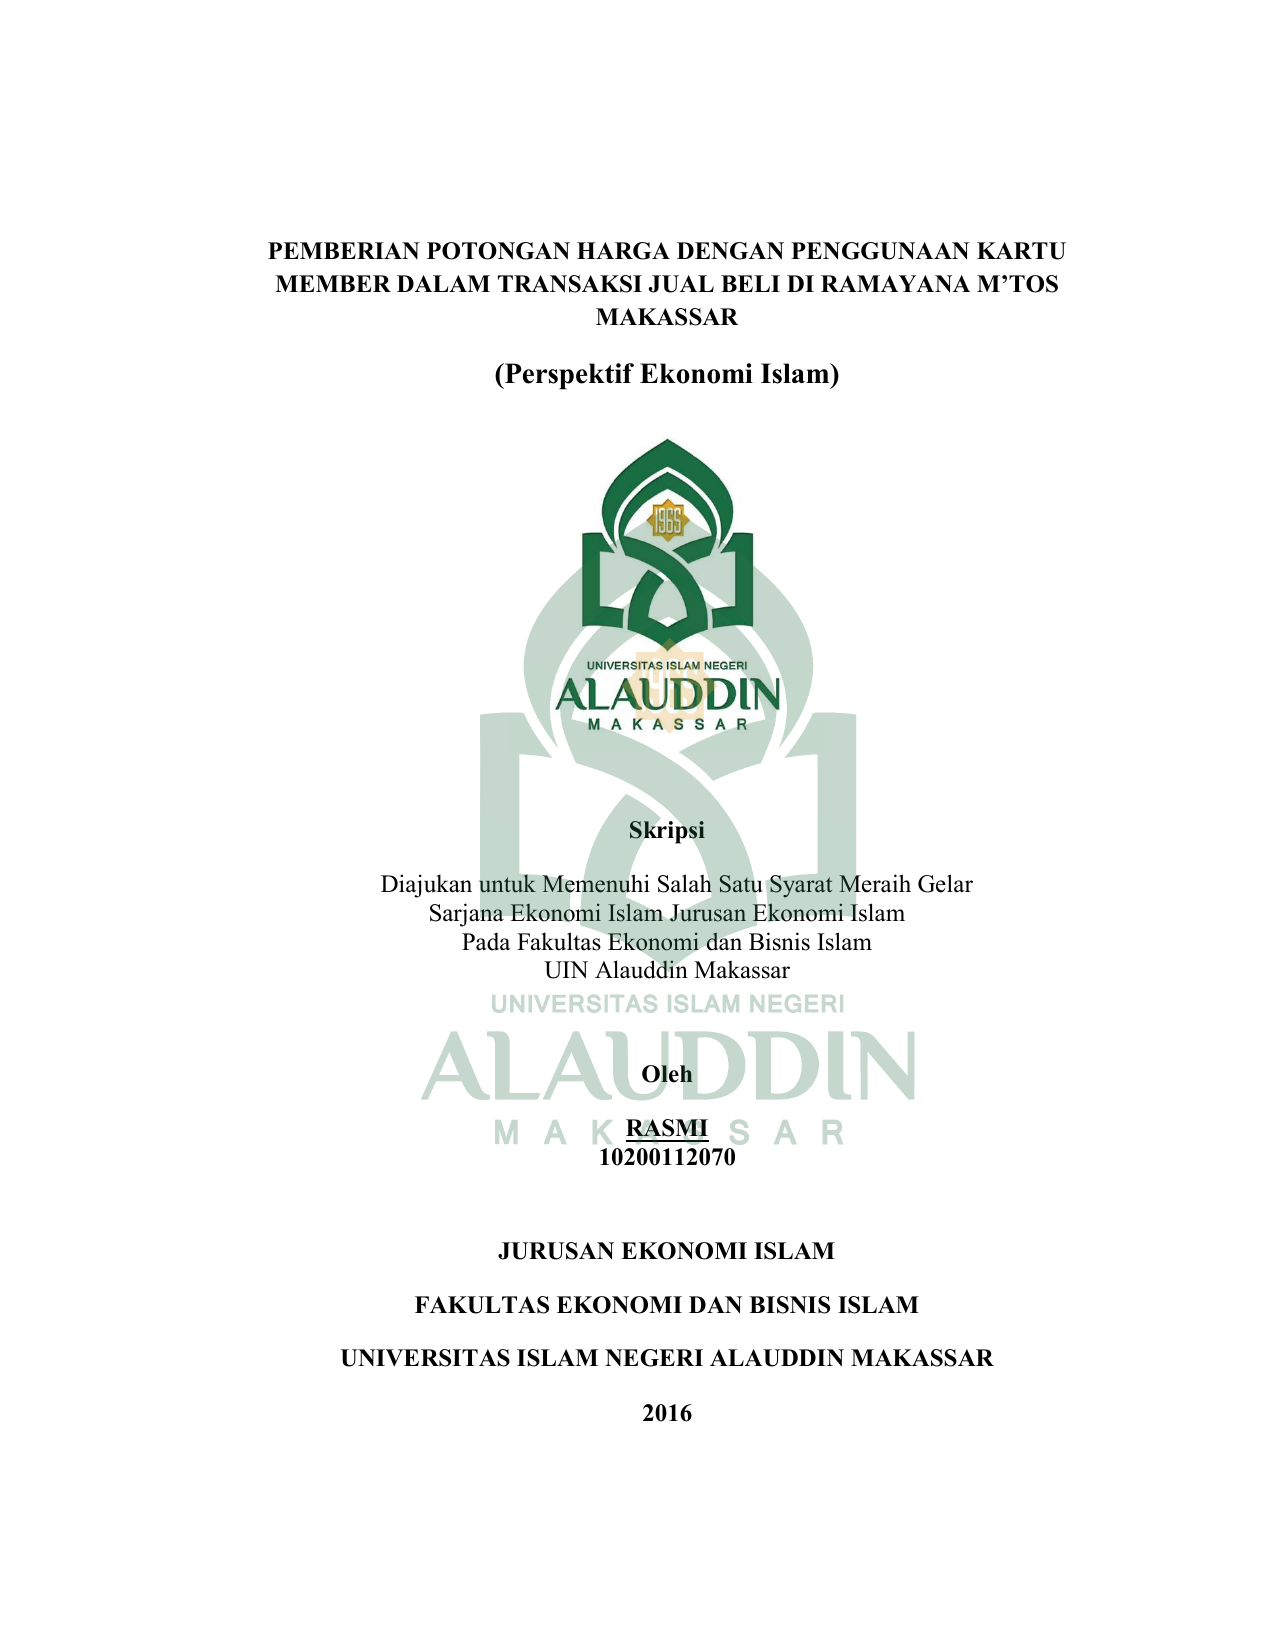 Perspektif Ekonomi Islam Repositori Uin Alauddin Makassar